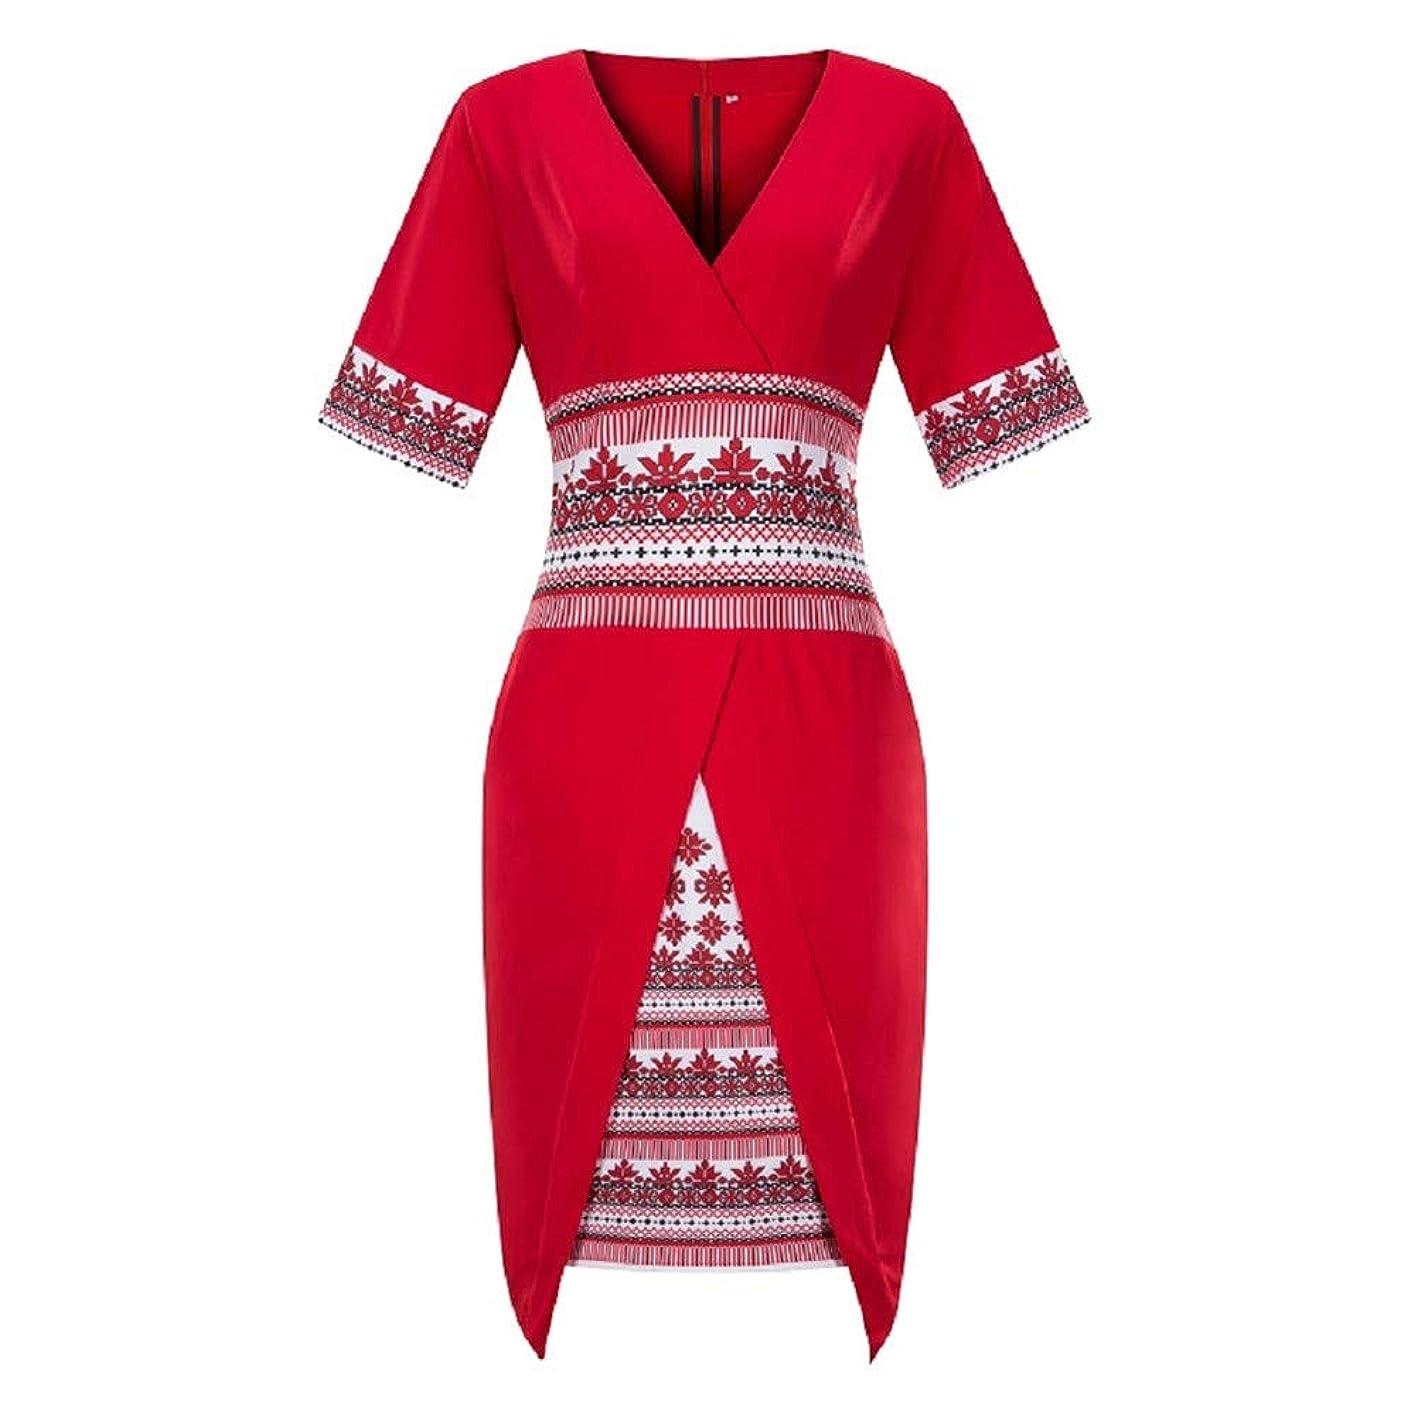 ShinFashion Women Dashiki African Style Patchwork Short Sleeve Midi Dress,XL-6XL skejxozpgdv799